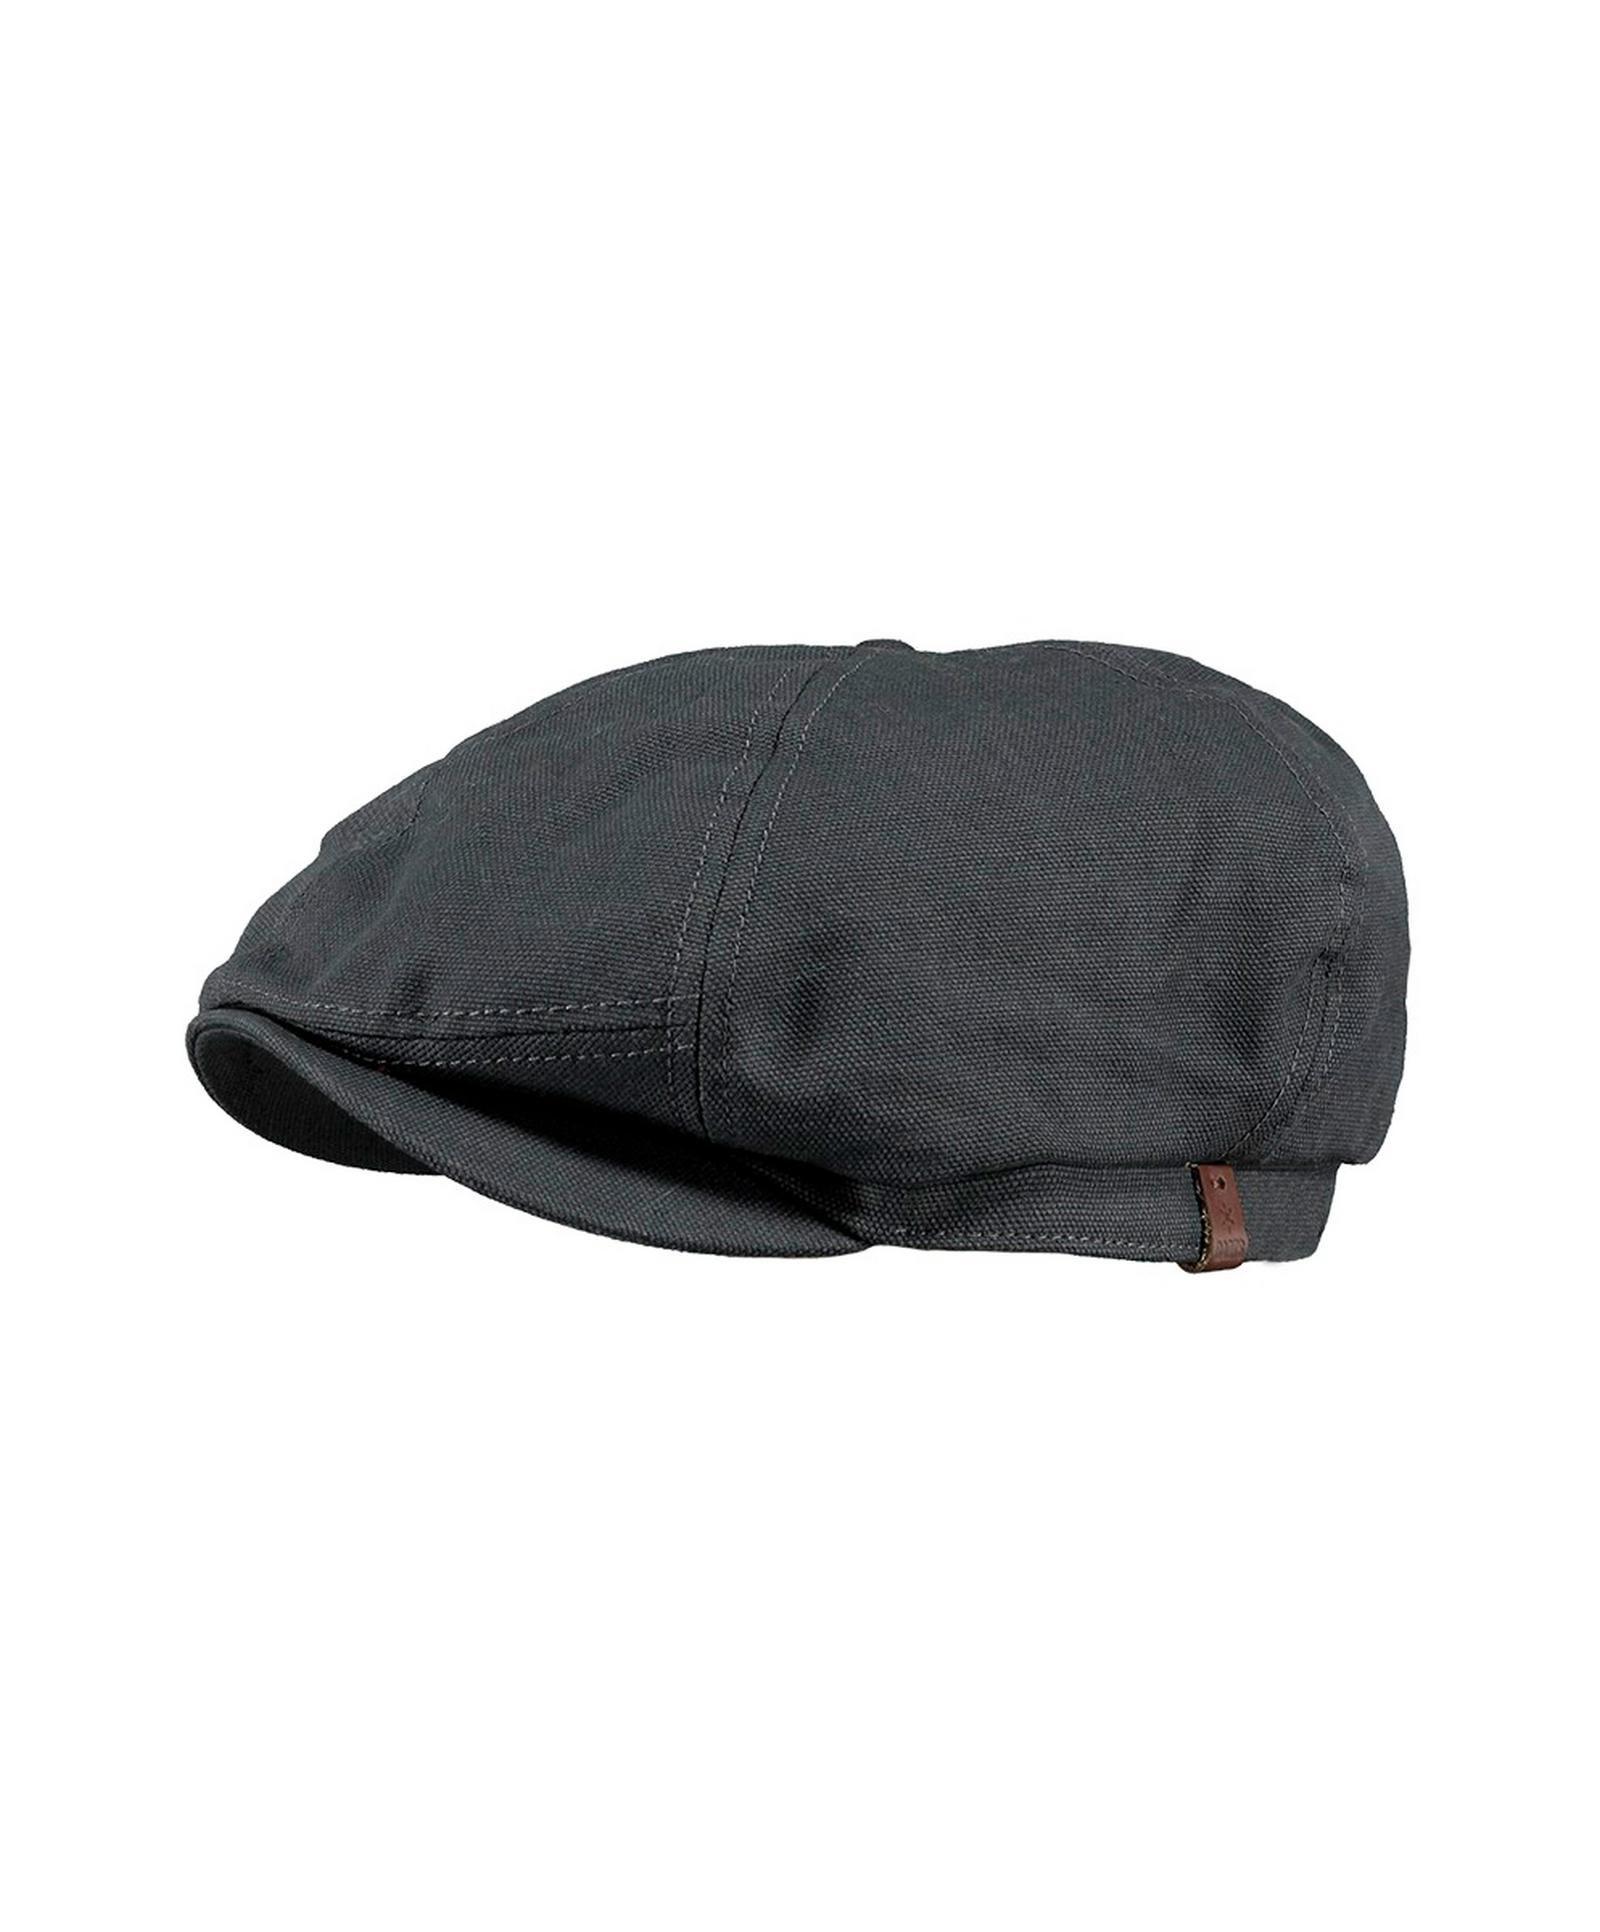 Pin van Andre Larkens op hatteras - Hats db7872bc714